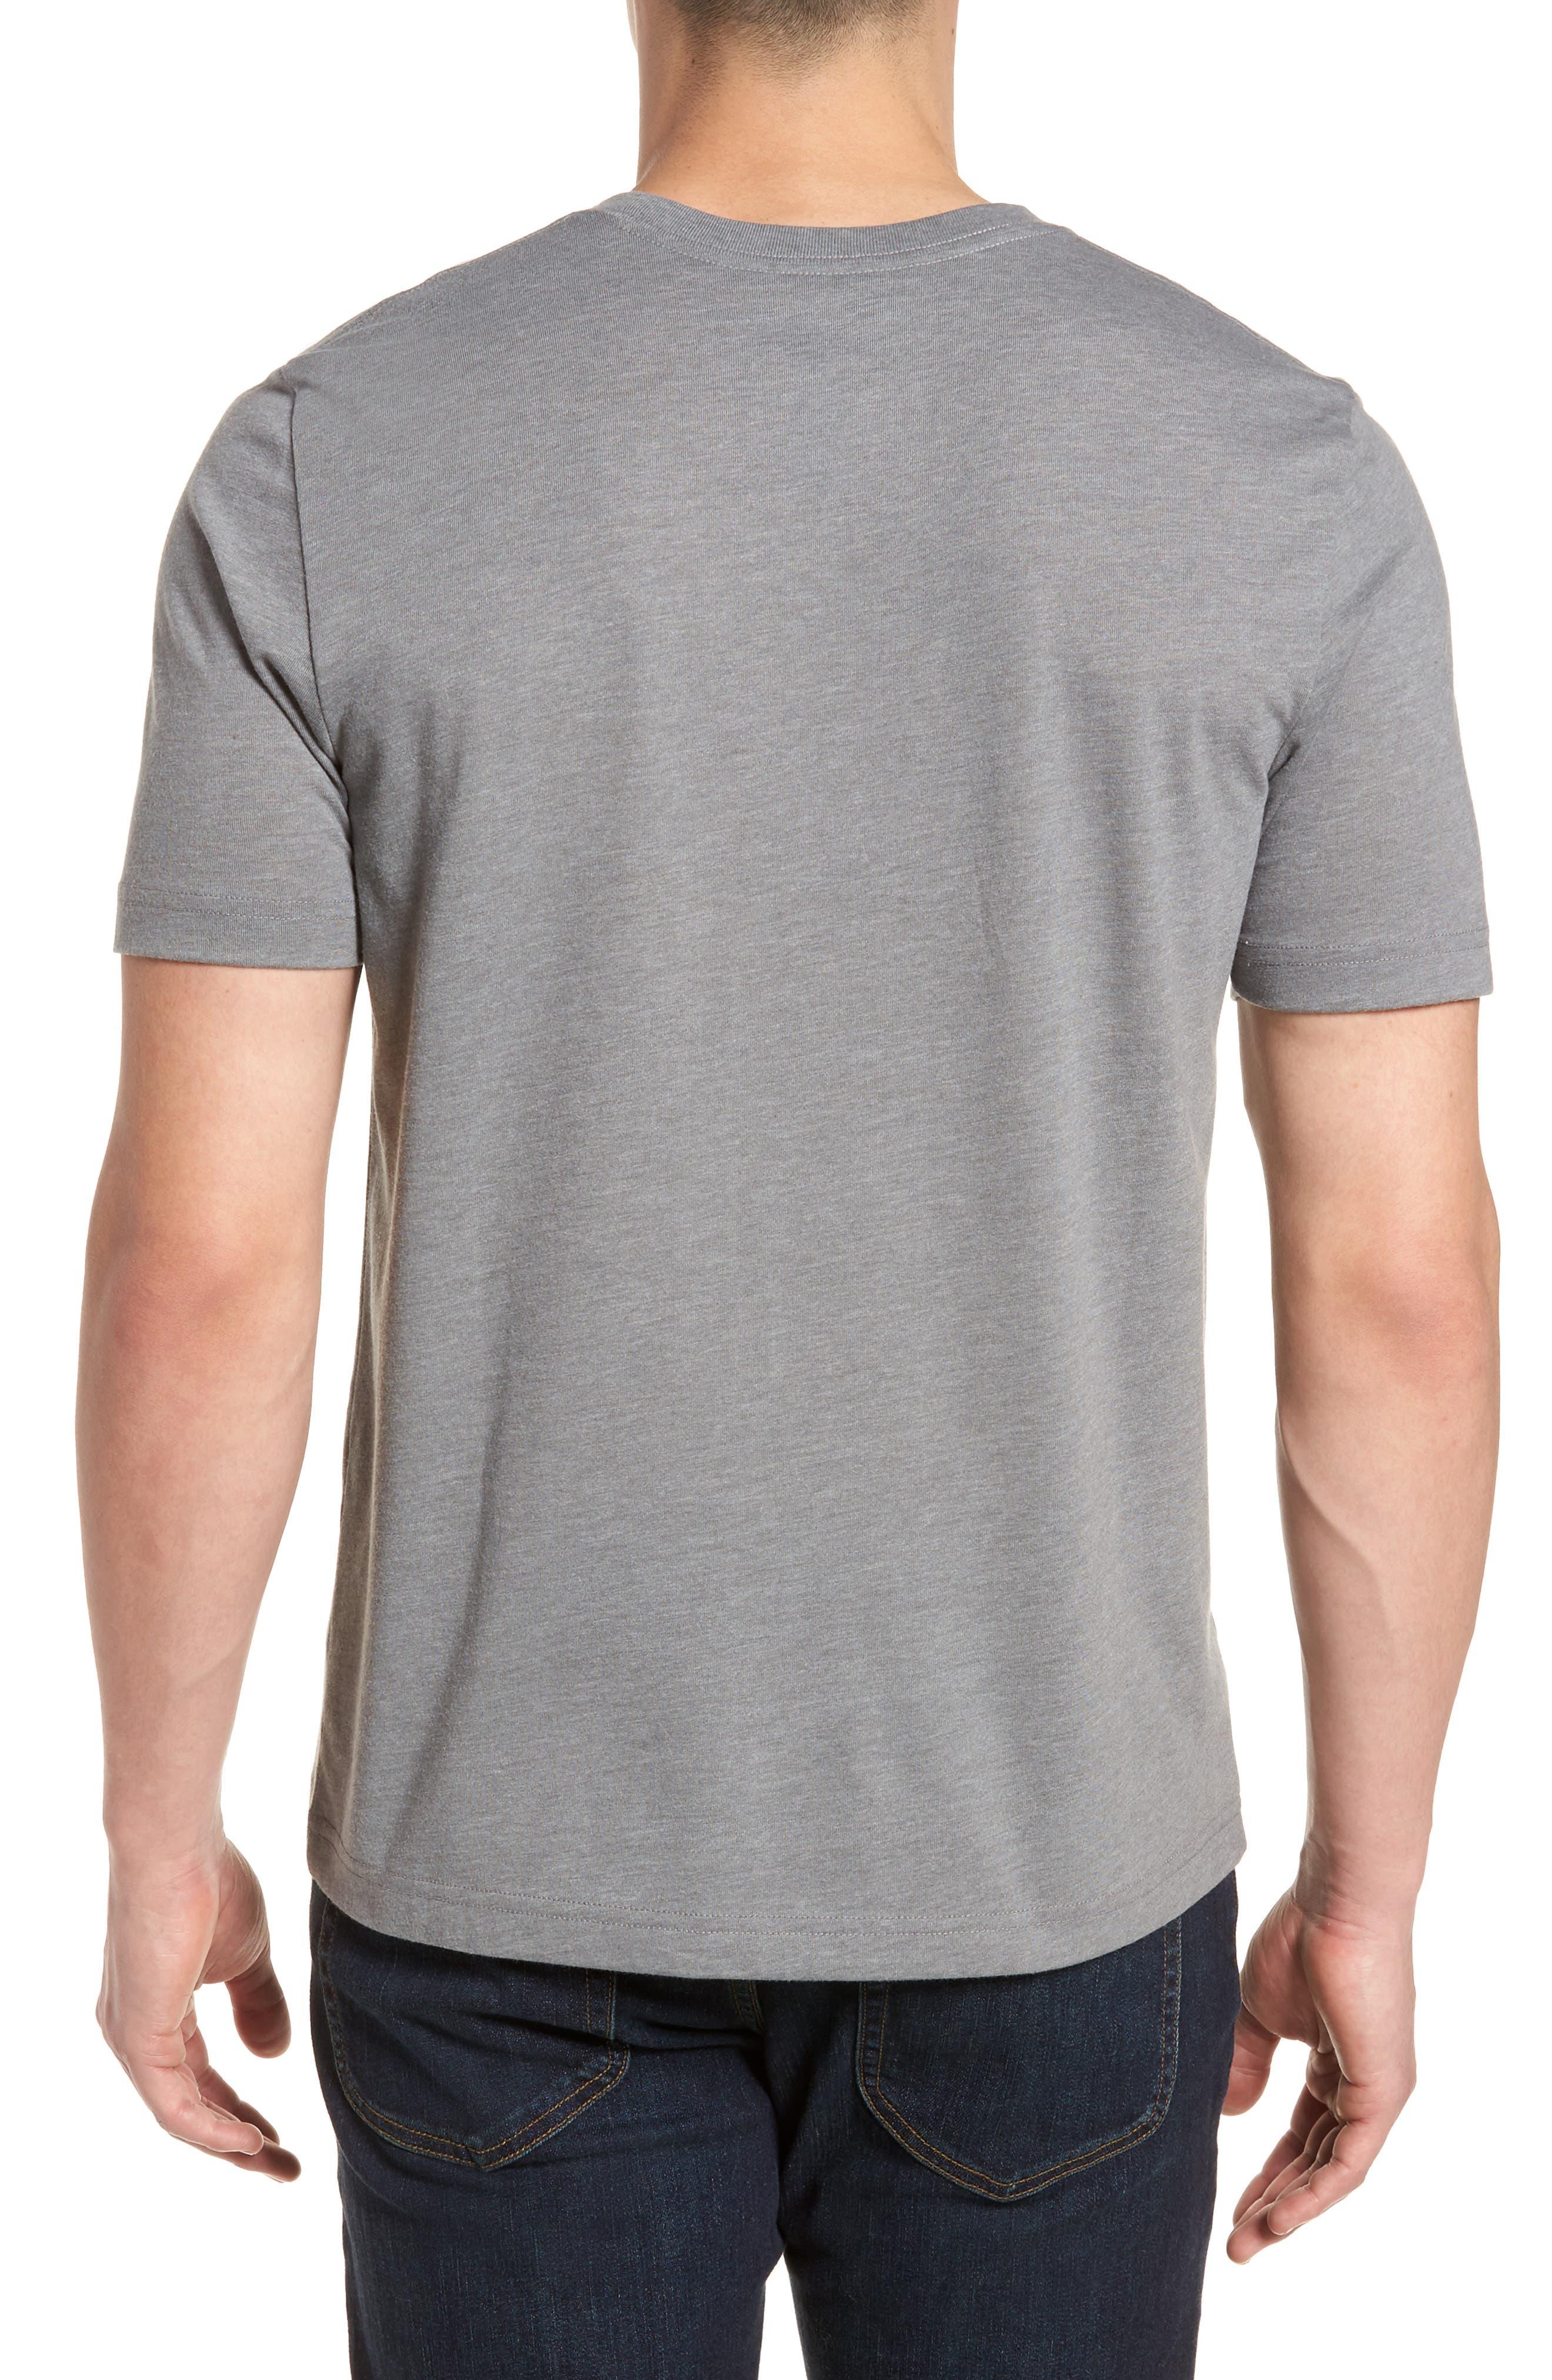 Chappy Doo Pocket T-Shirt,                             Alternate thumbnail 2, color,                             Heather Grey